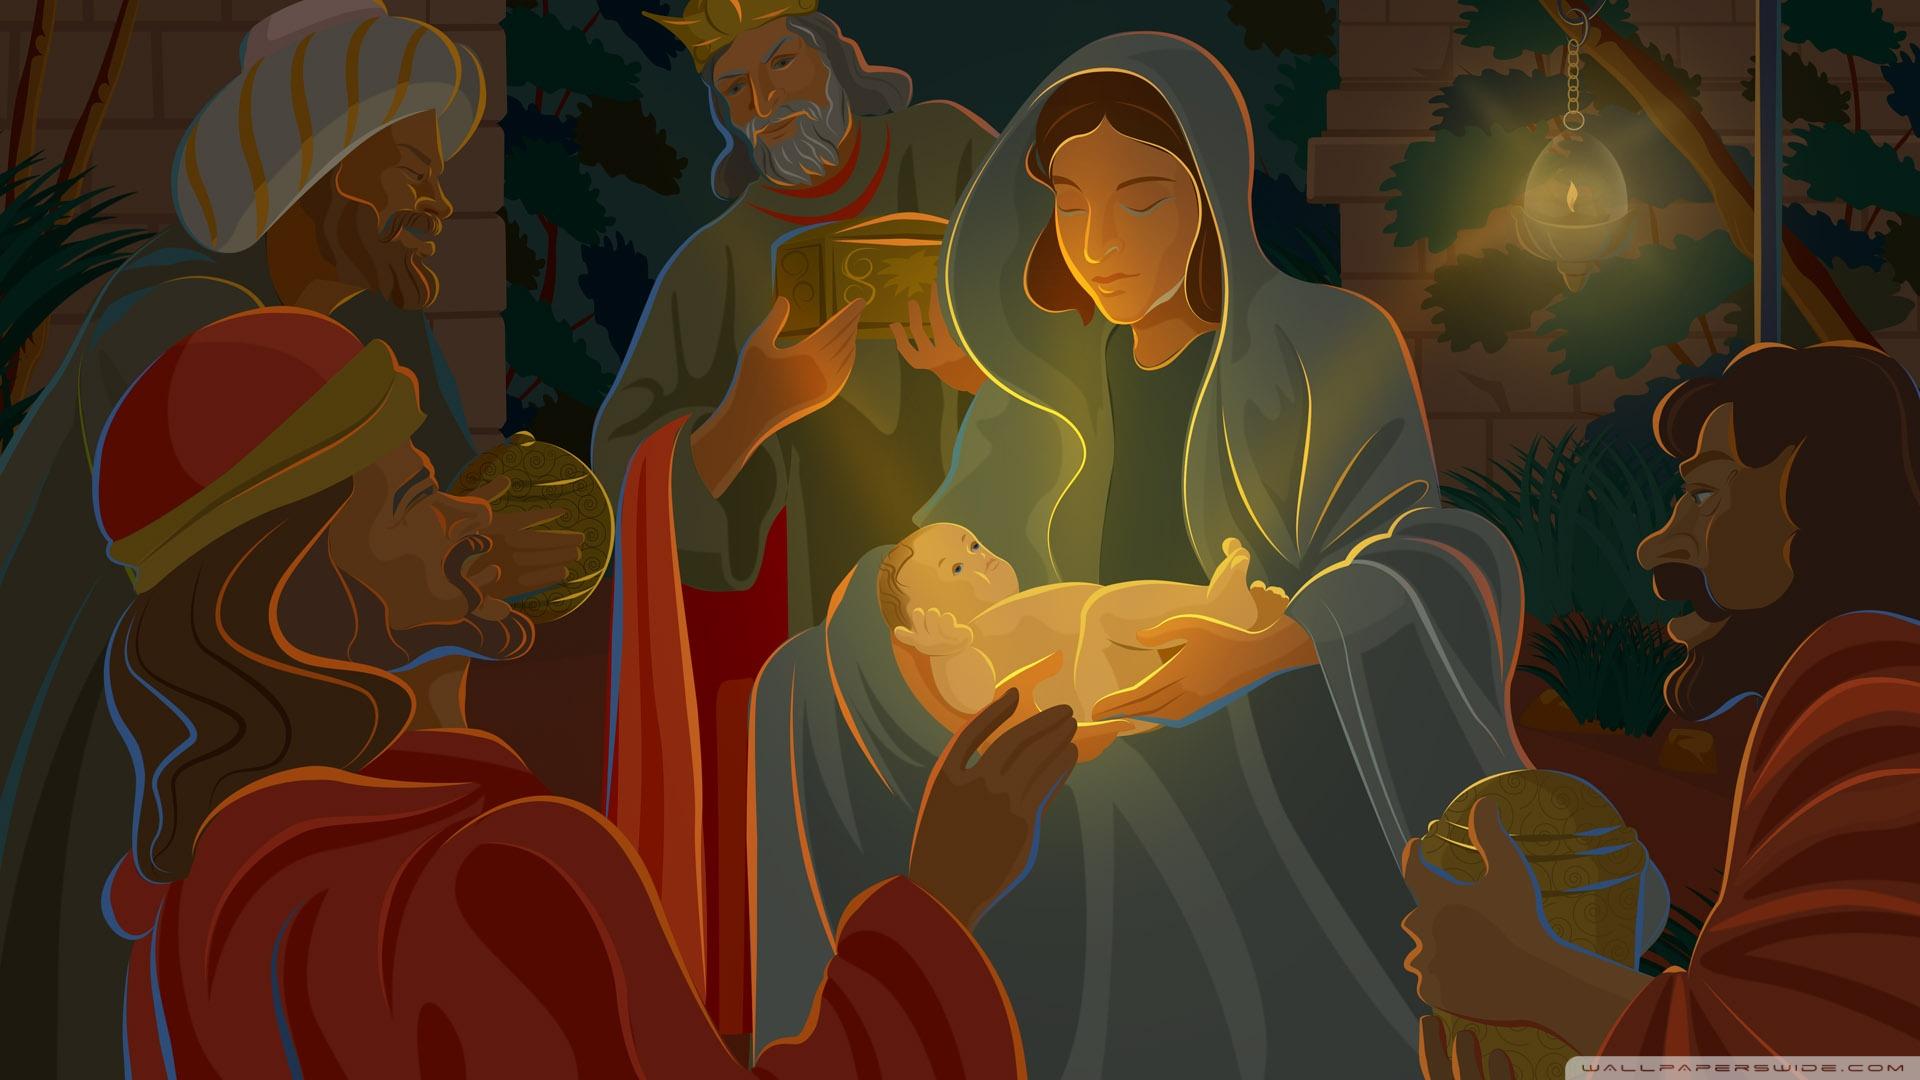 night of jesus christ